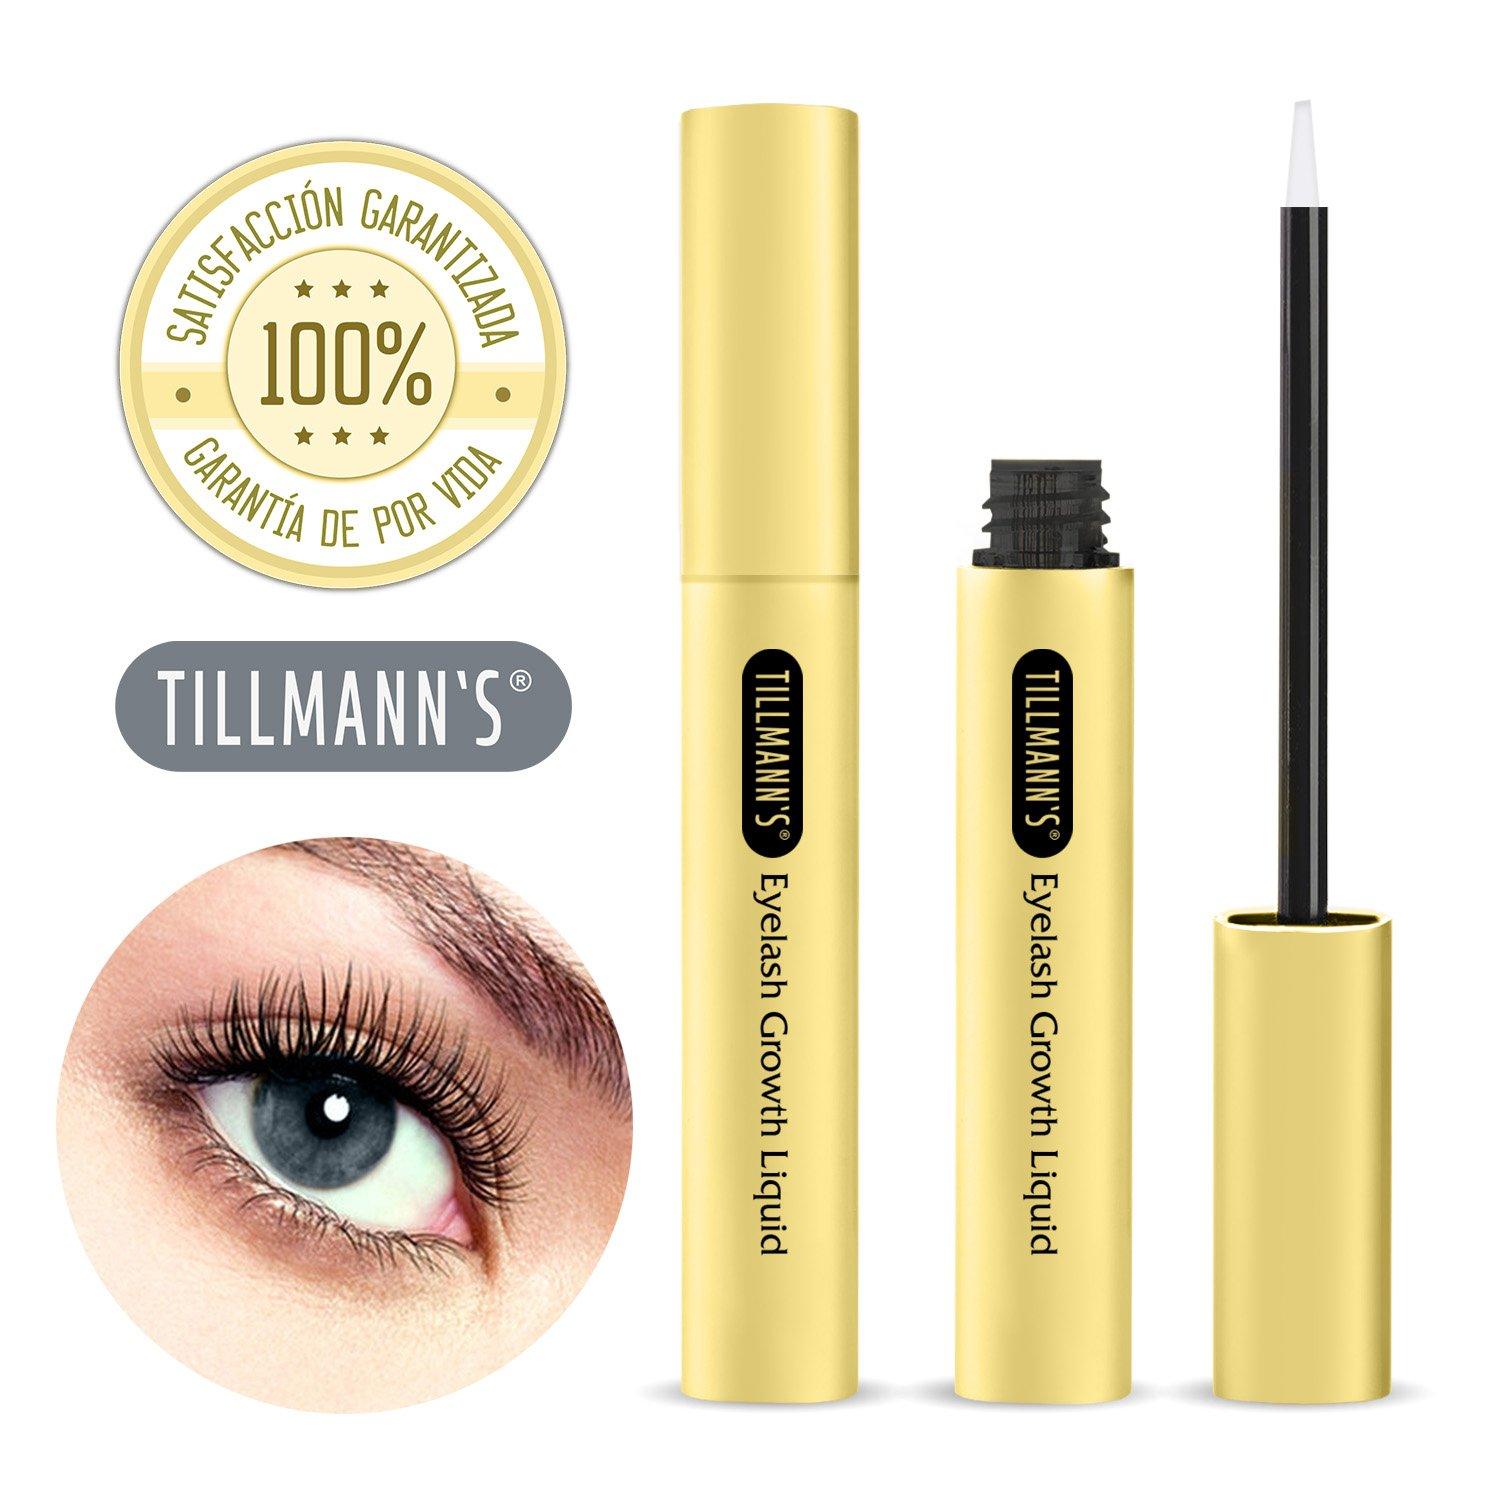 Tillmann\'s ® Serum Pestañas - Crece Pestañas Tratamiento - Para Tener Pestañas Largas Y Volumen